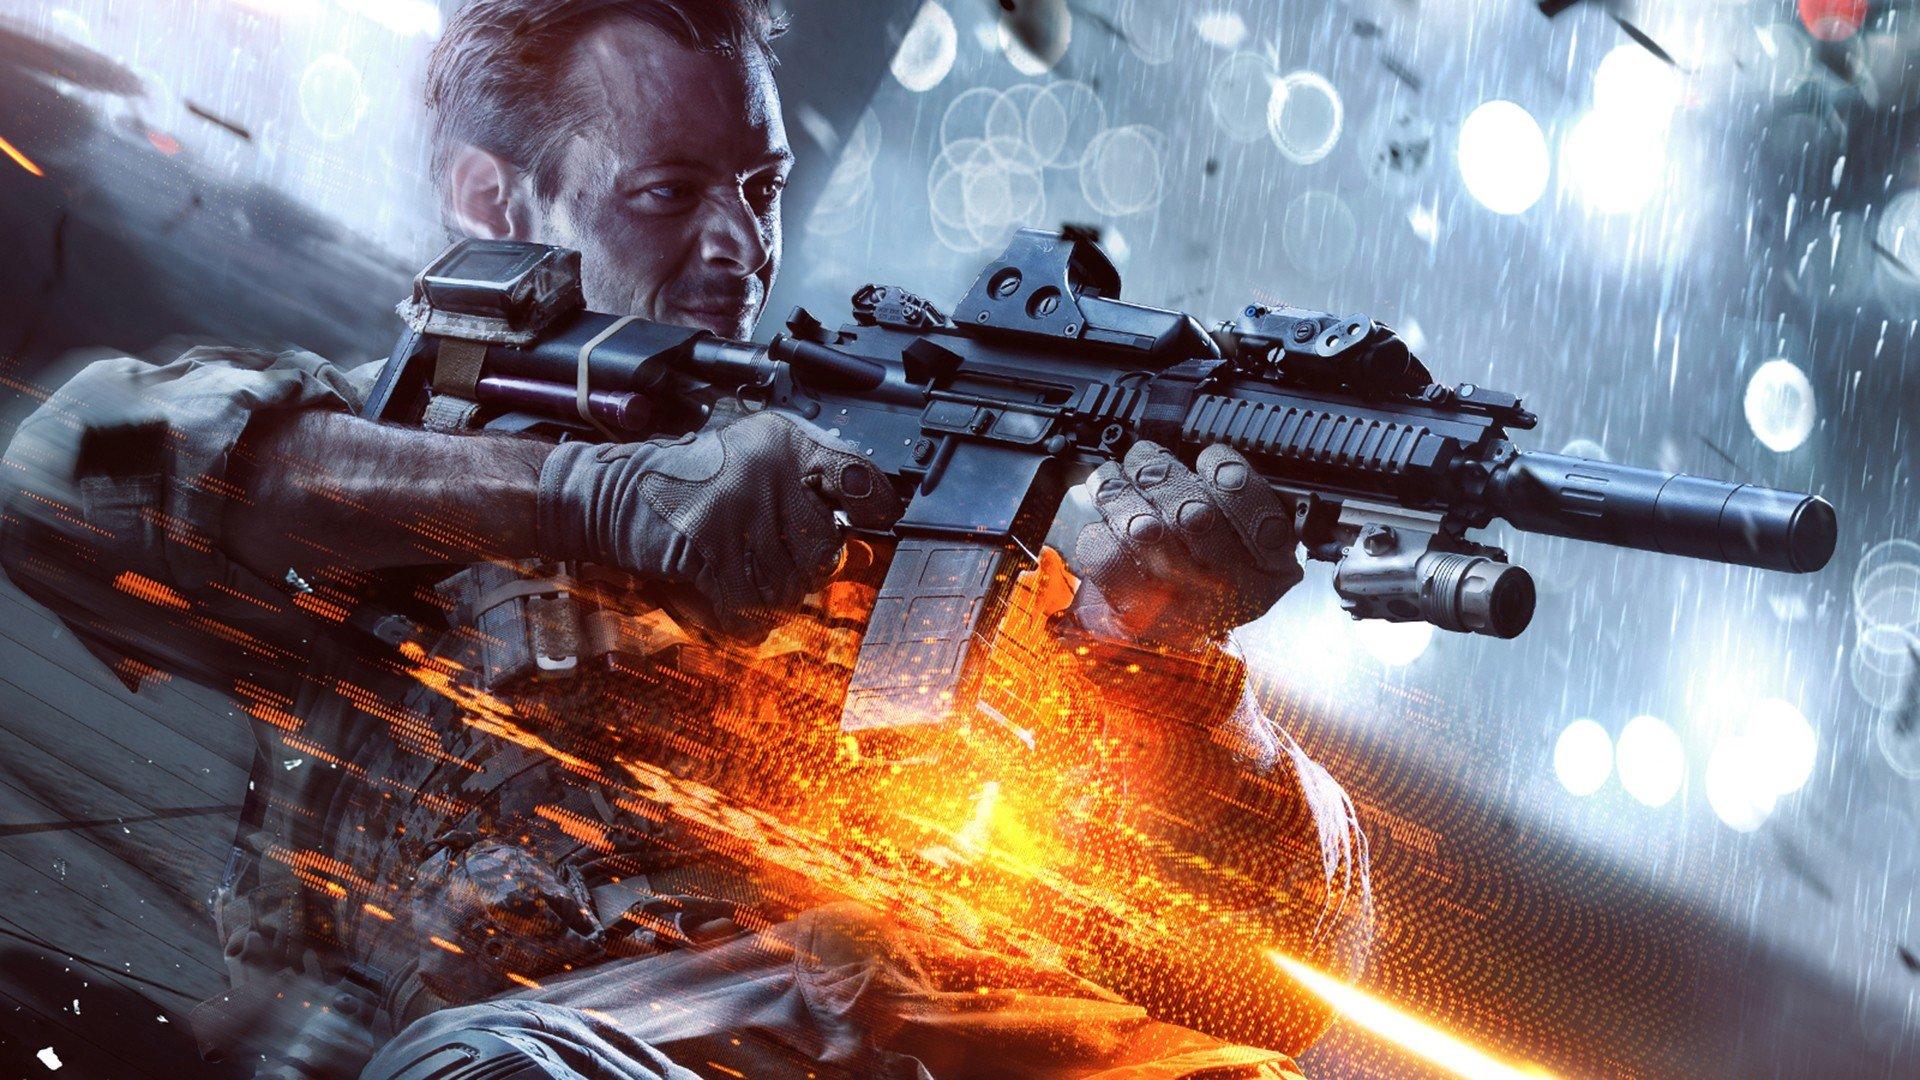 Battlefield 4 Wallpapers Hd For Desktop Backgrounds